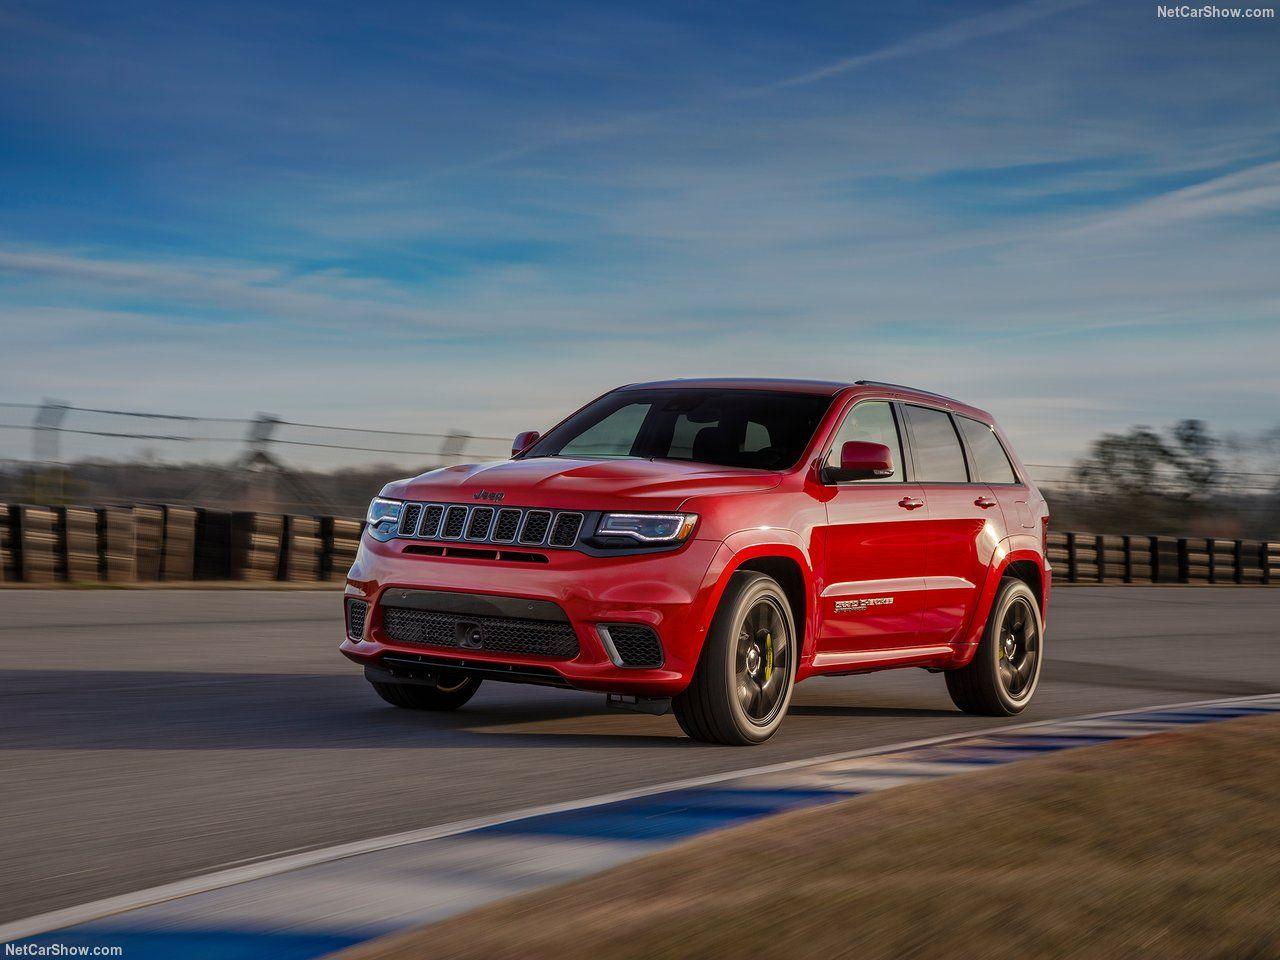 2021 Grand Cherokee Srt Hellcat New Review